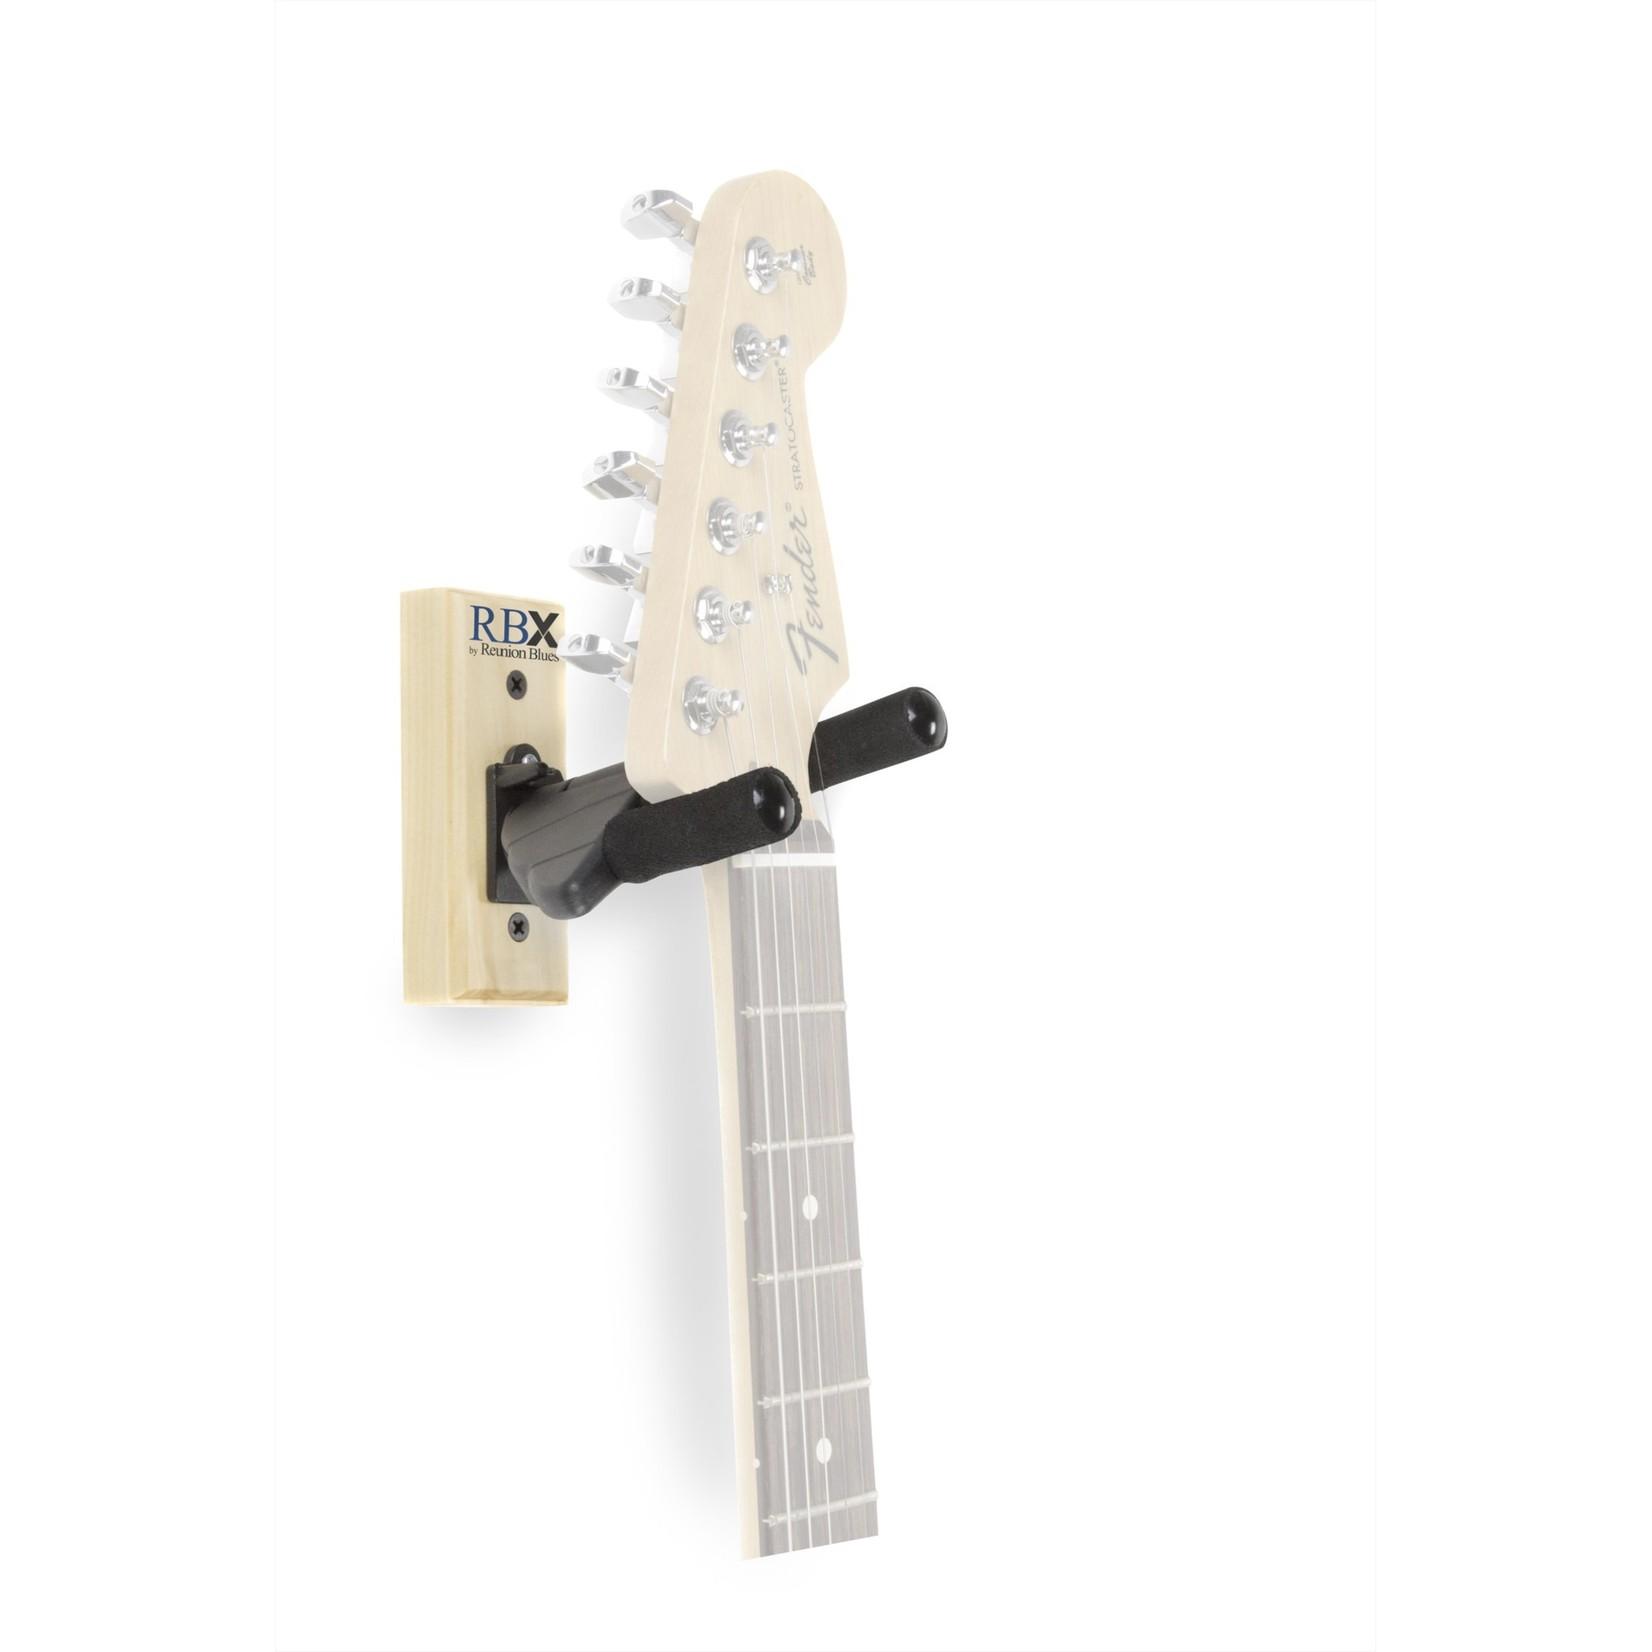 Reunion Blues Reunion Blues RBXS-WHBK Guitar/Bass Wall Hanger with Padded Self-Locking Yoke, Natural